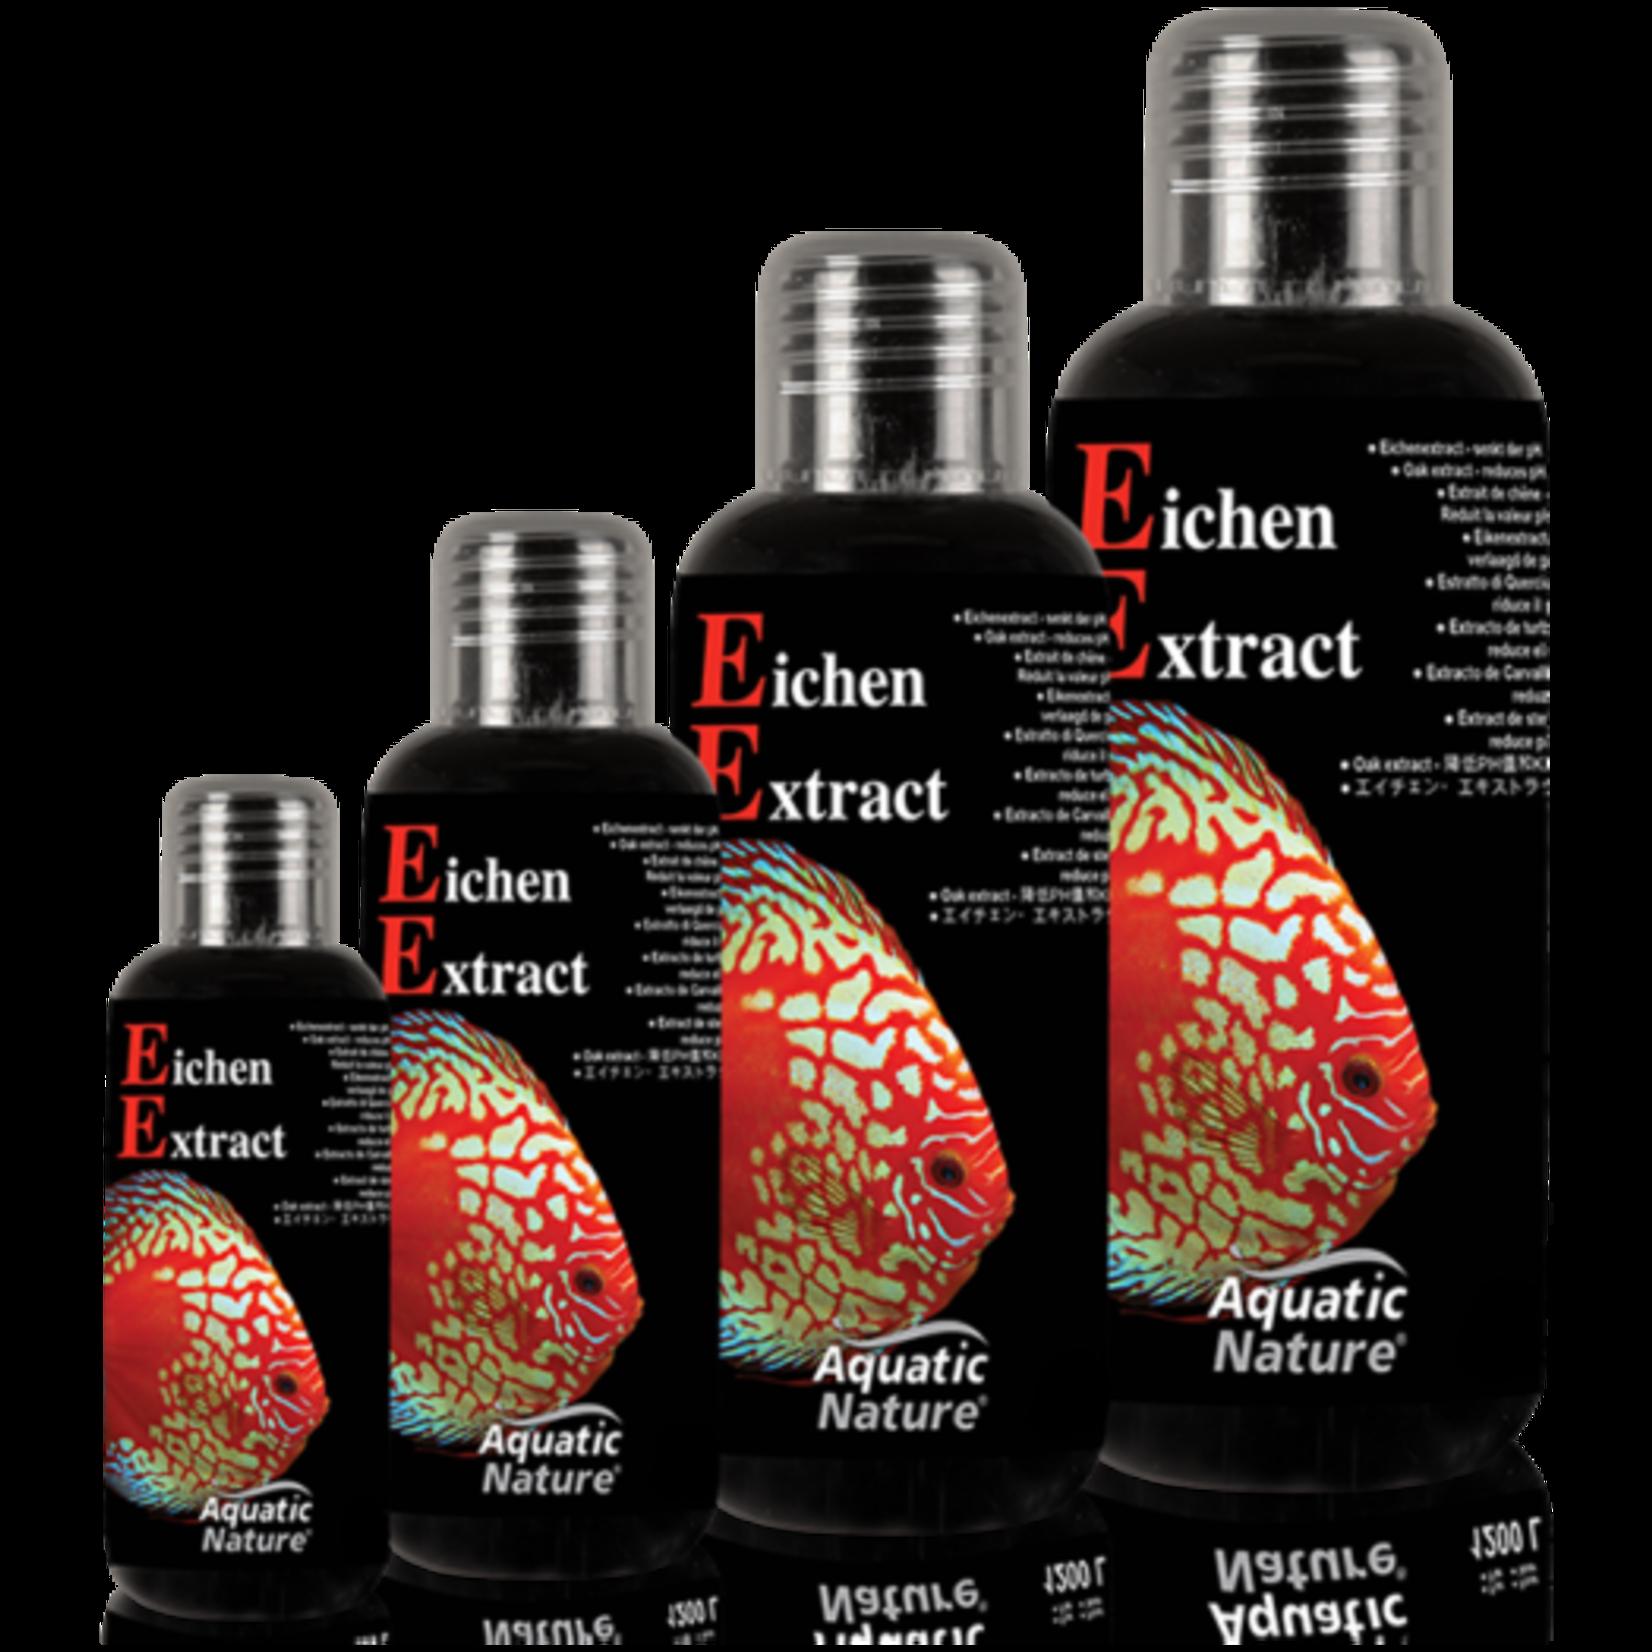 Aquatic Nature Eiken extract - EICHEN EXTRAKT